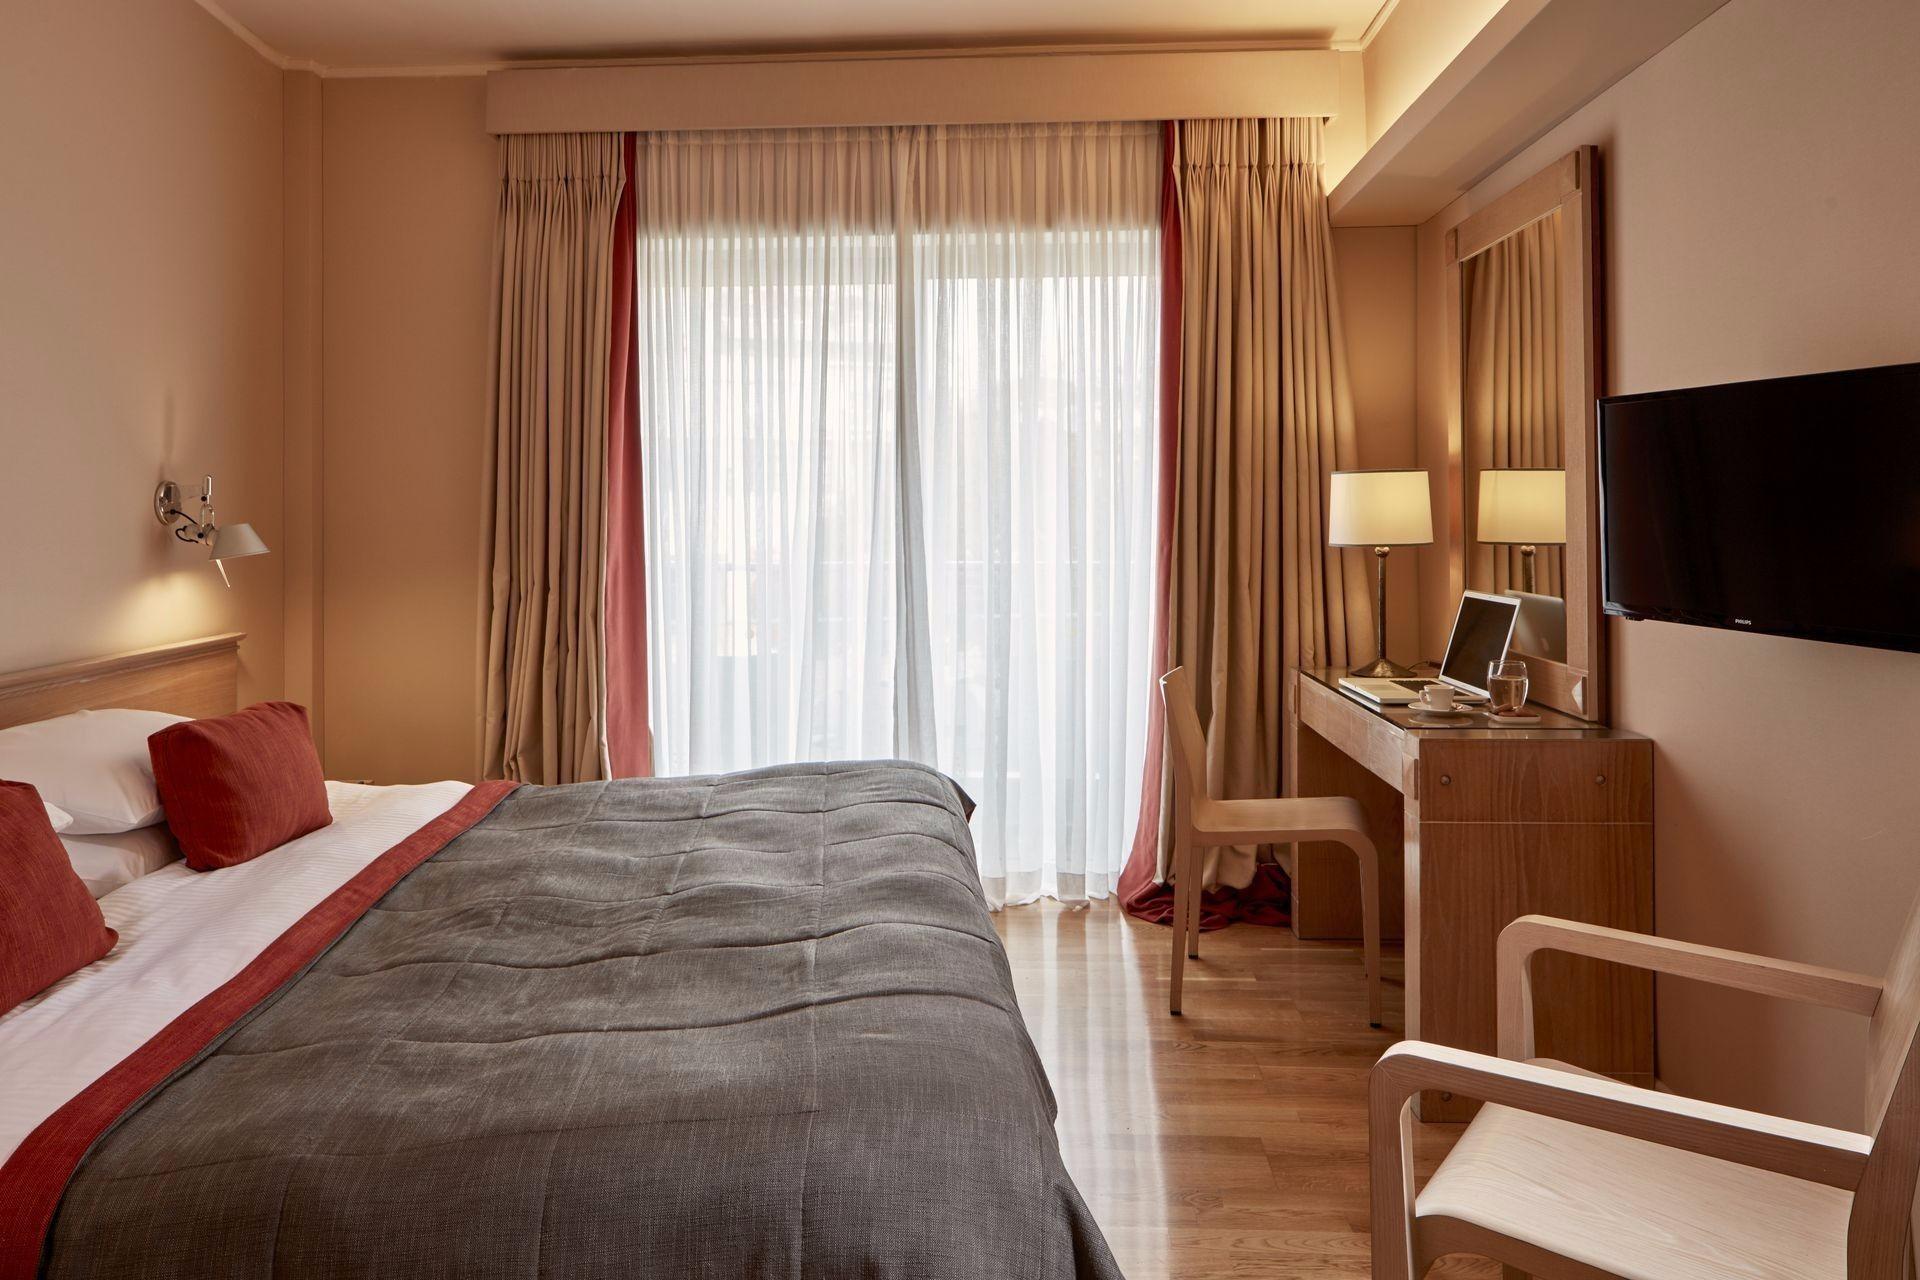 standard_double room_herodion_hotel.jpeg